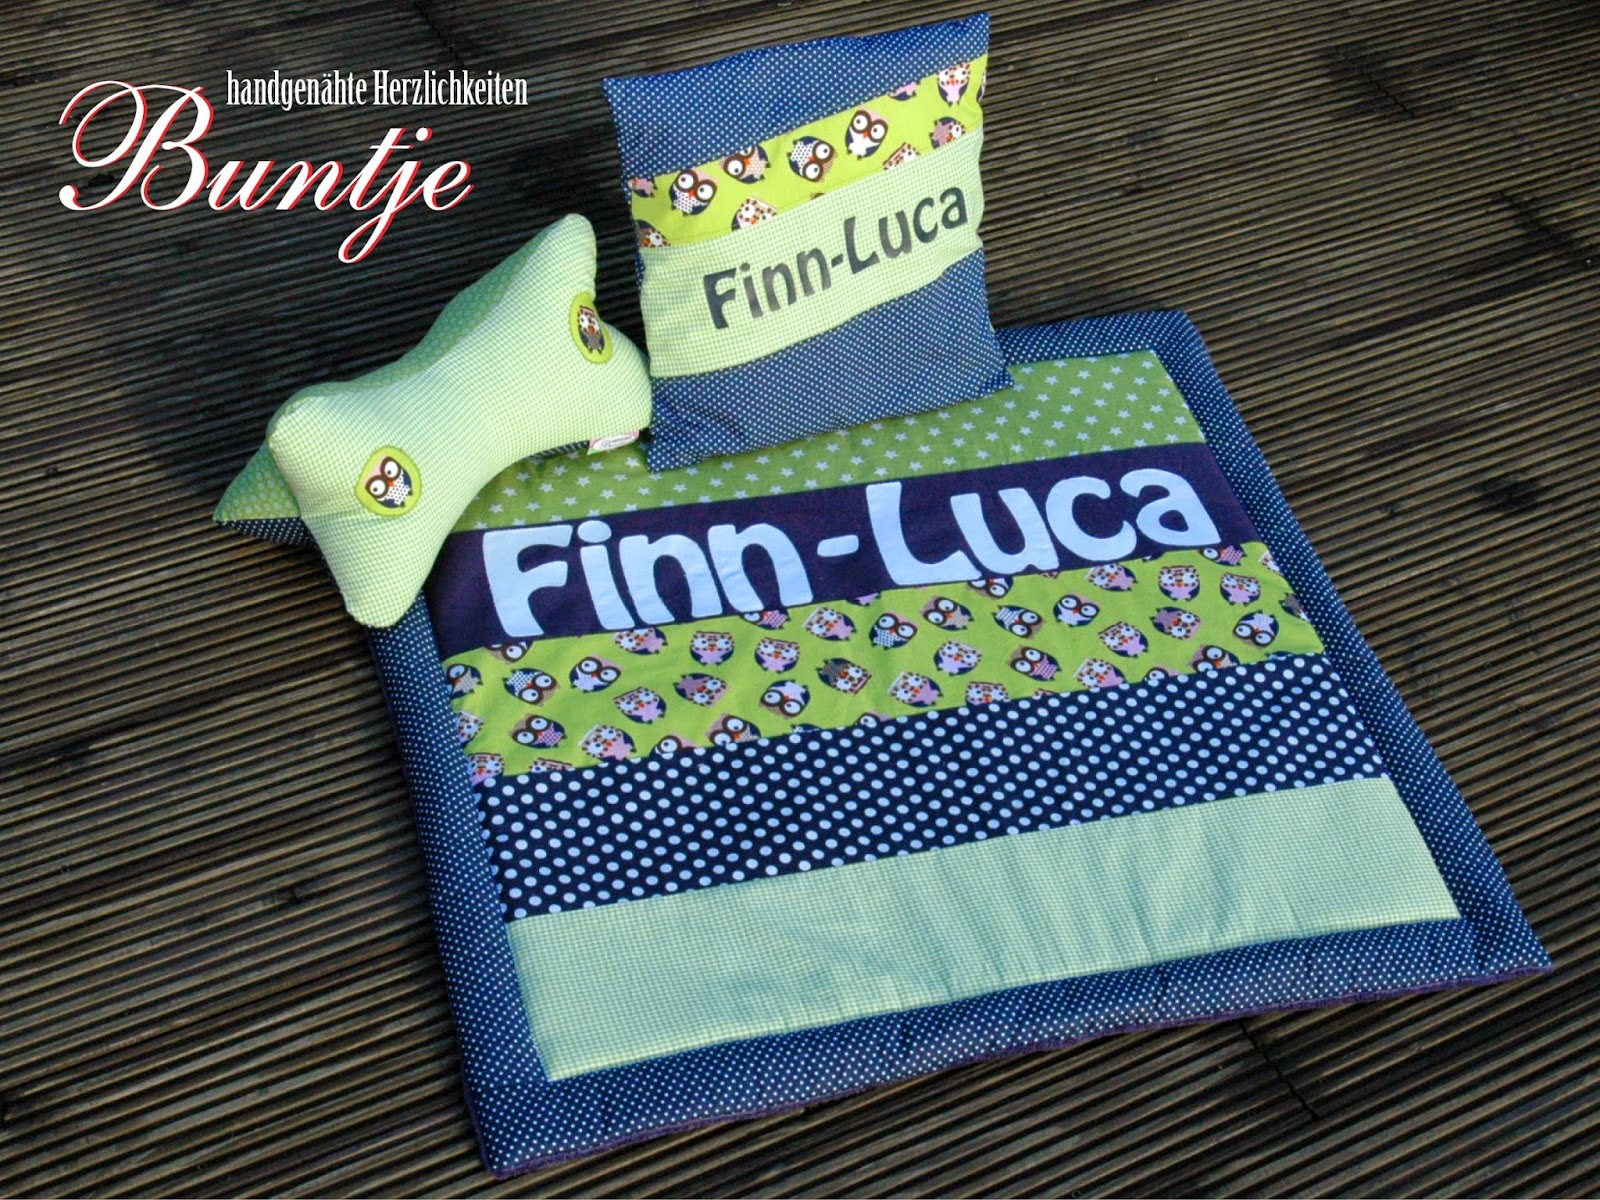 Krabbeldecke Kuscheldecke Decke Baby Name Geschenk Geburt Taufe Junge Finn-Luca grün blau Eulen Fleece Baumwolle Buntje nähen